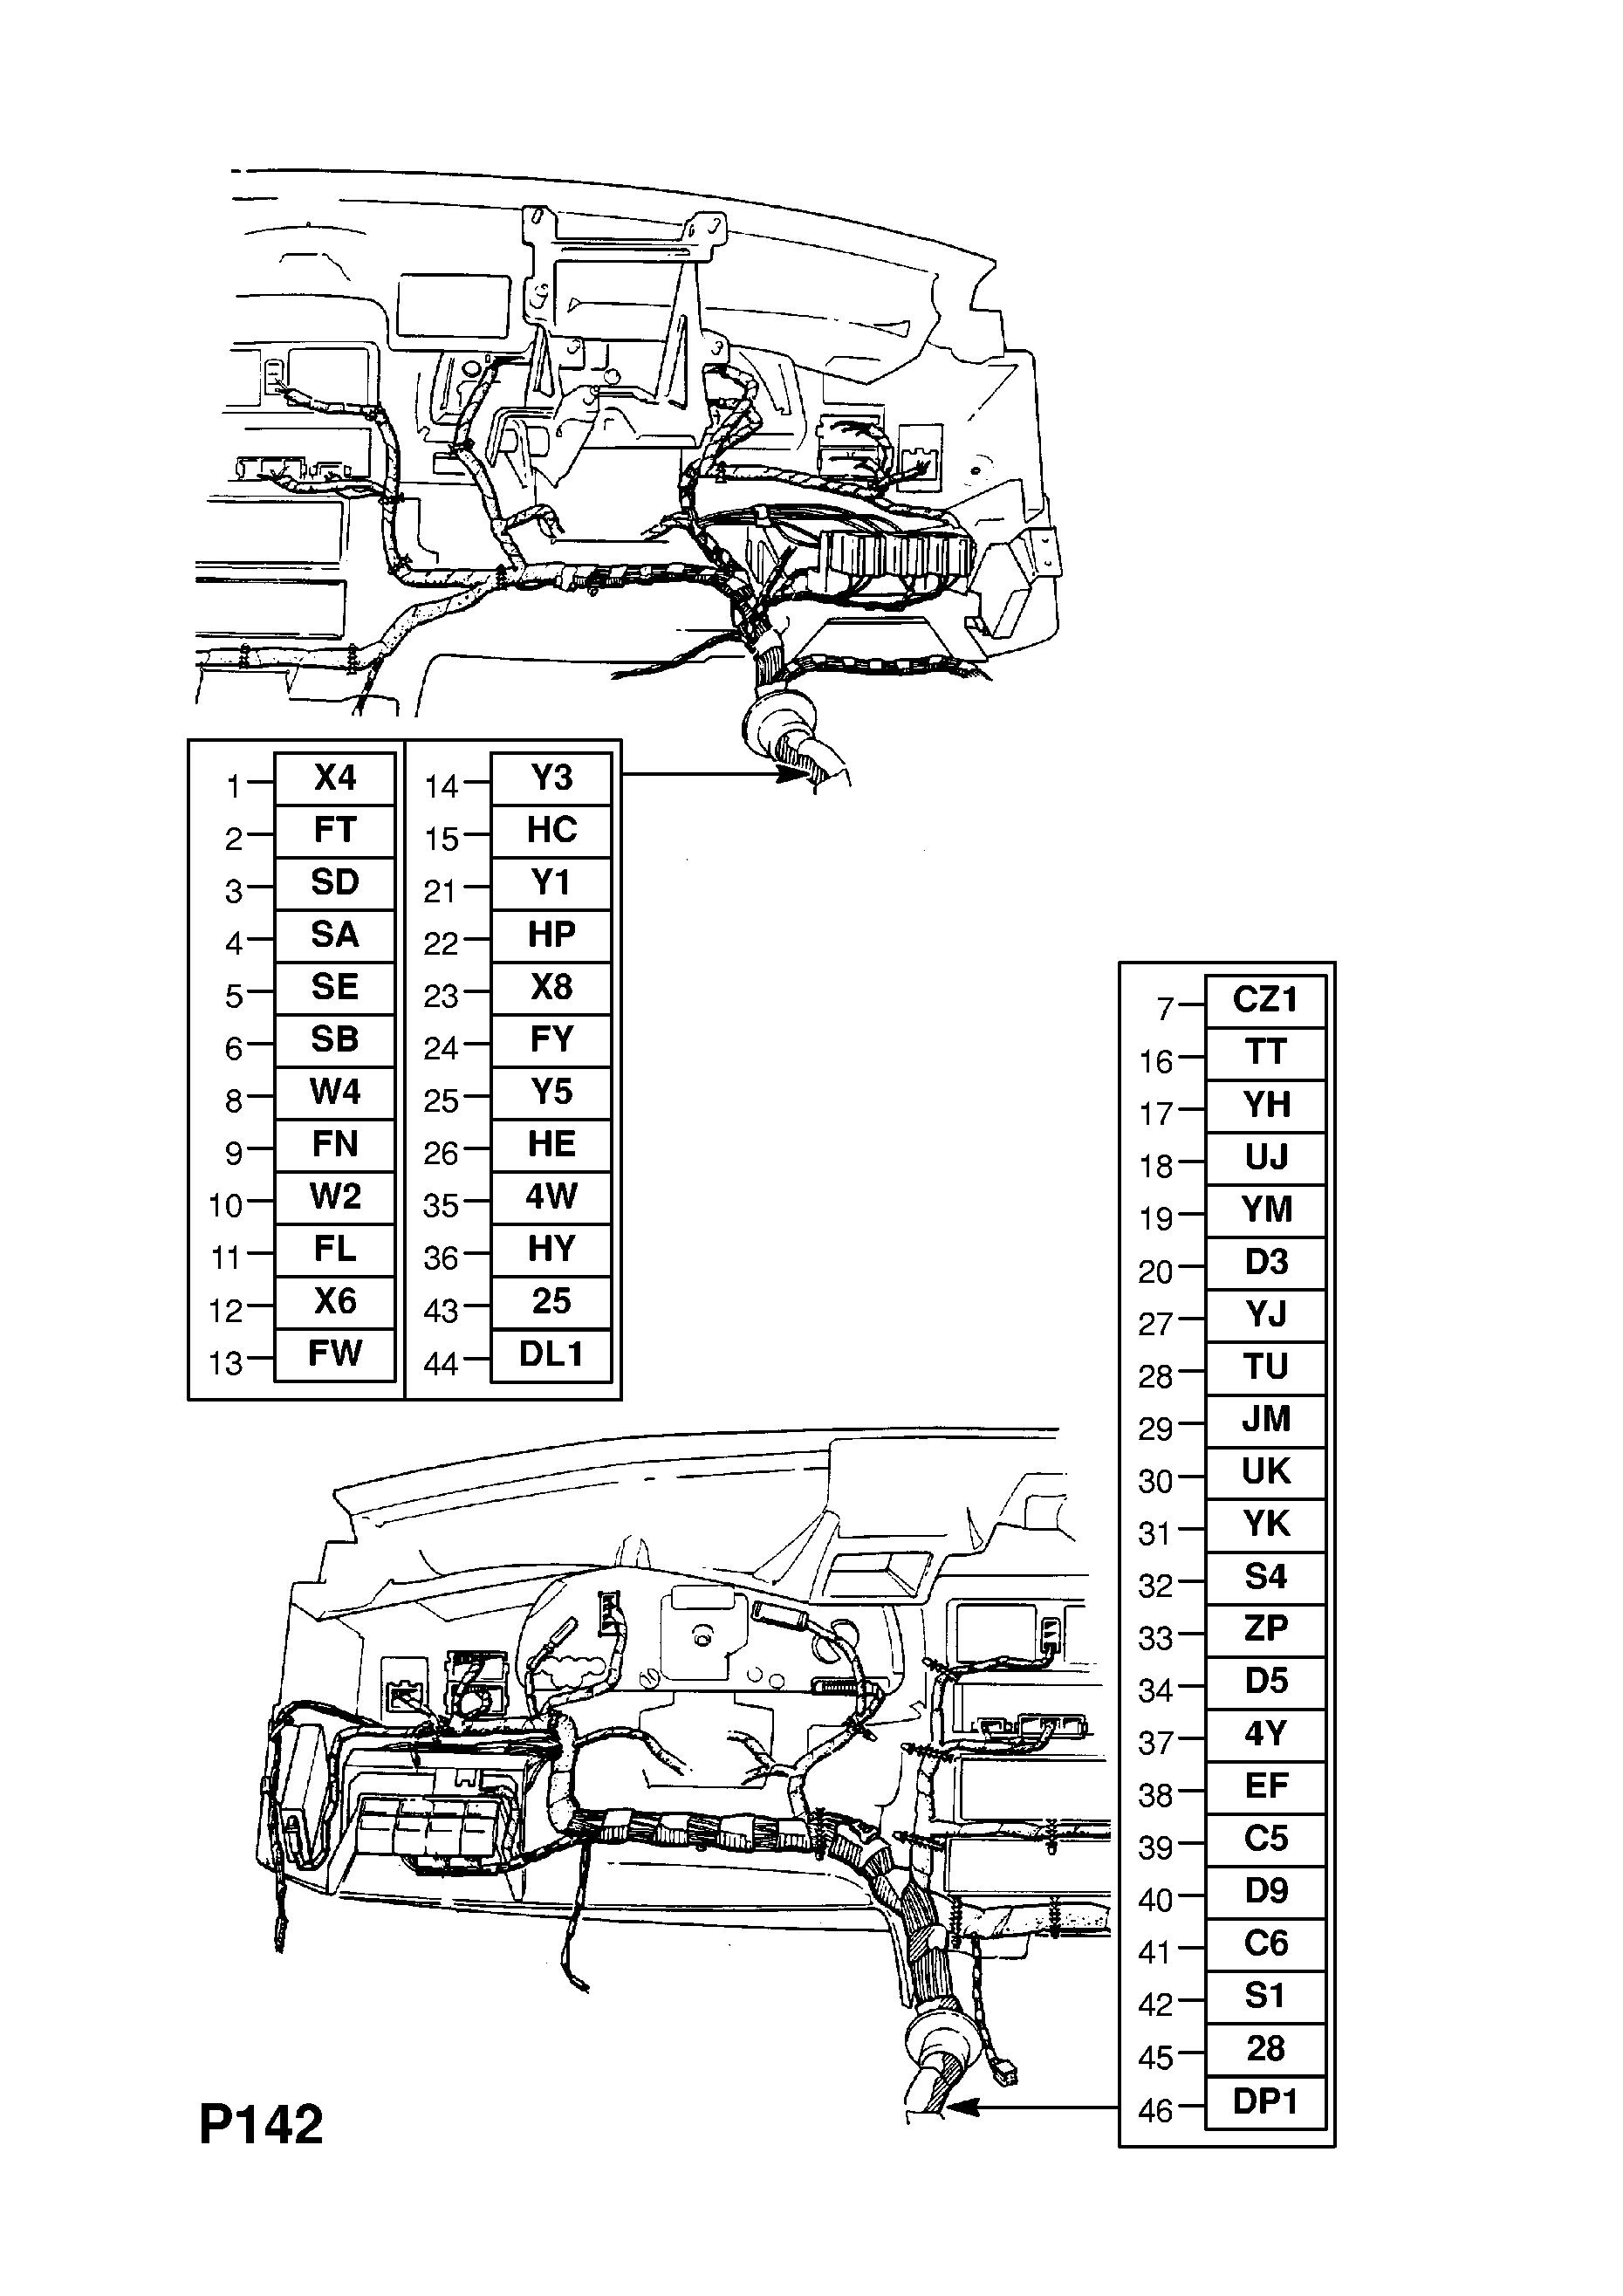 Vauxhall Cavalier 1989 1995 P Electrical 8 Wiring Harness 88 Ef Gm Part Number Genuine Description Range Instrument Panel